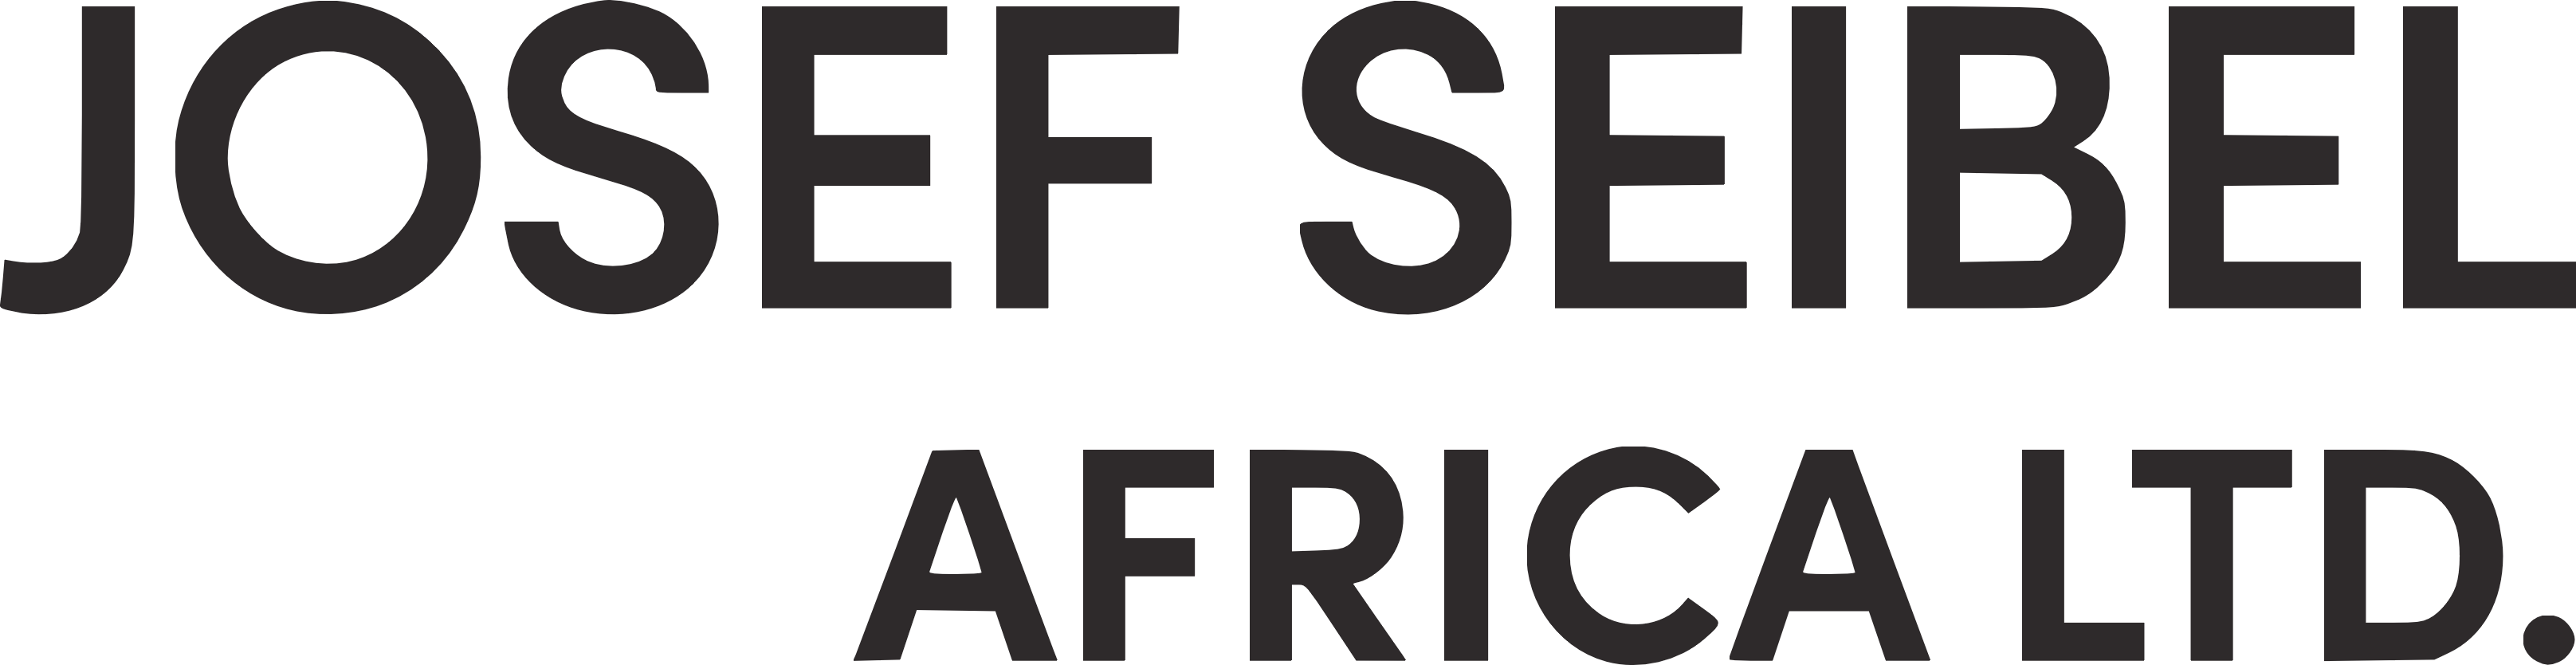 Josef Seibel Africa